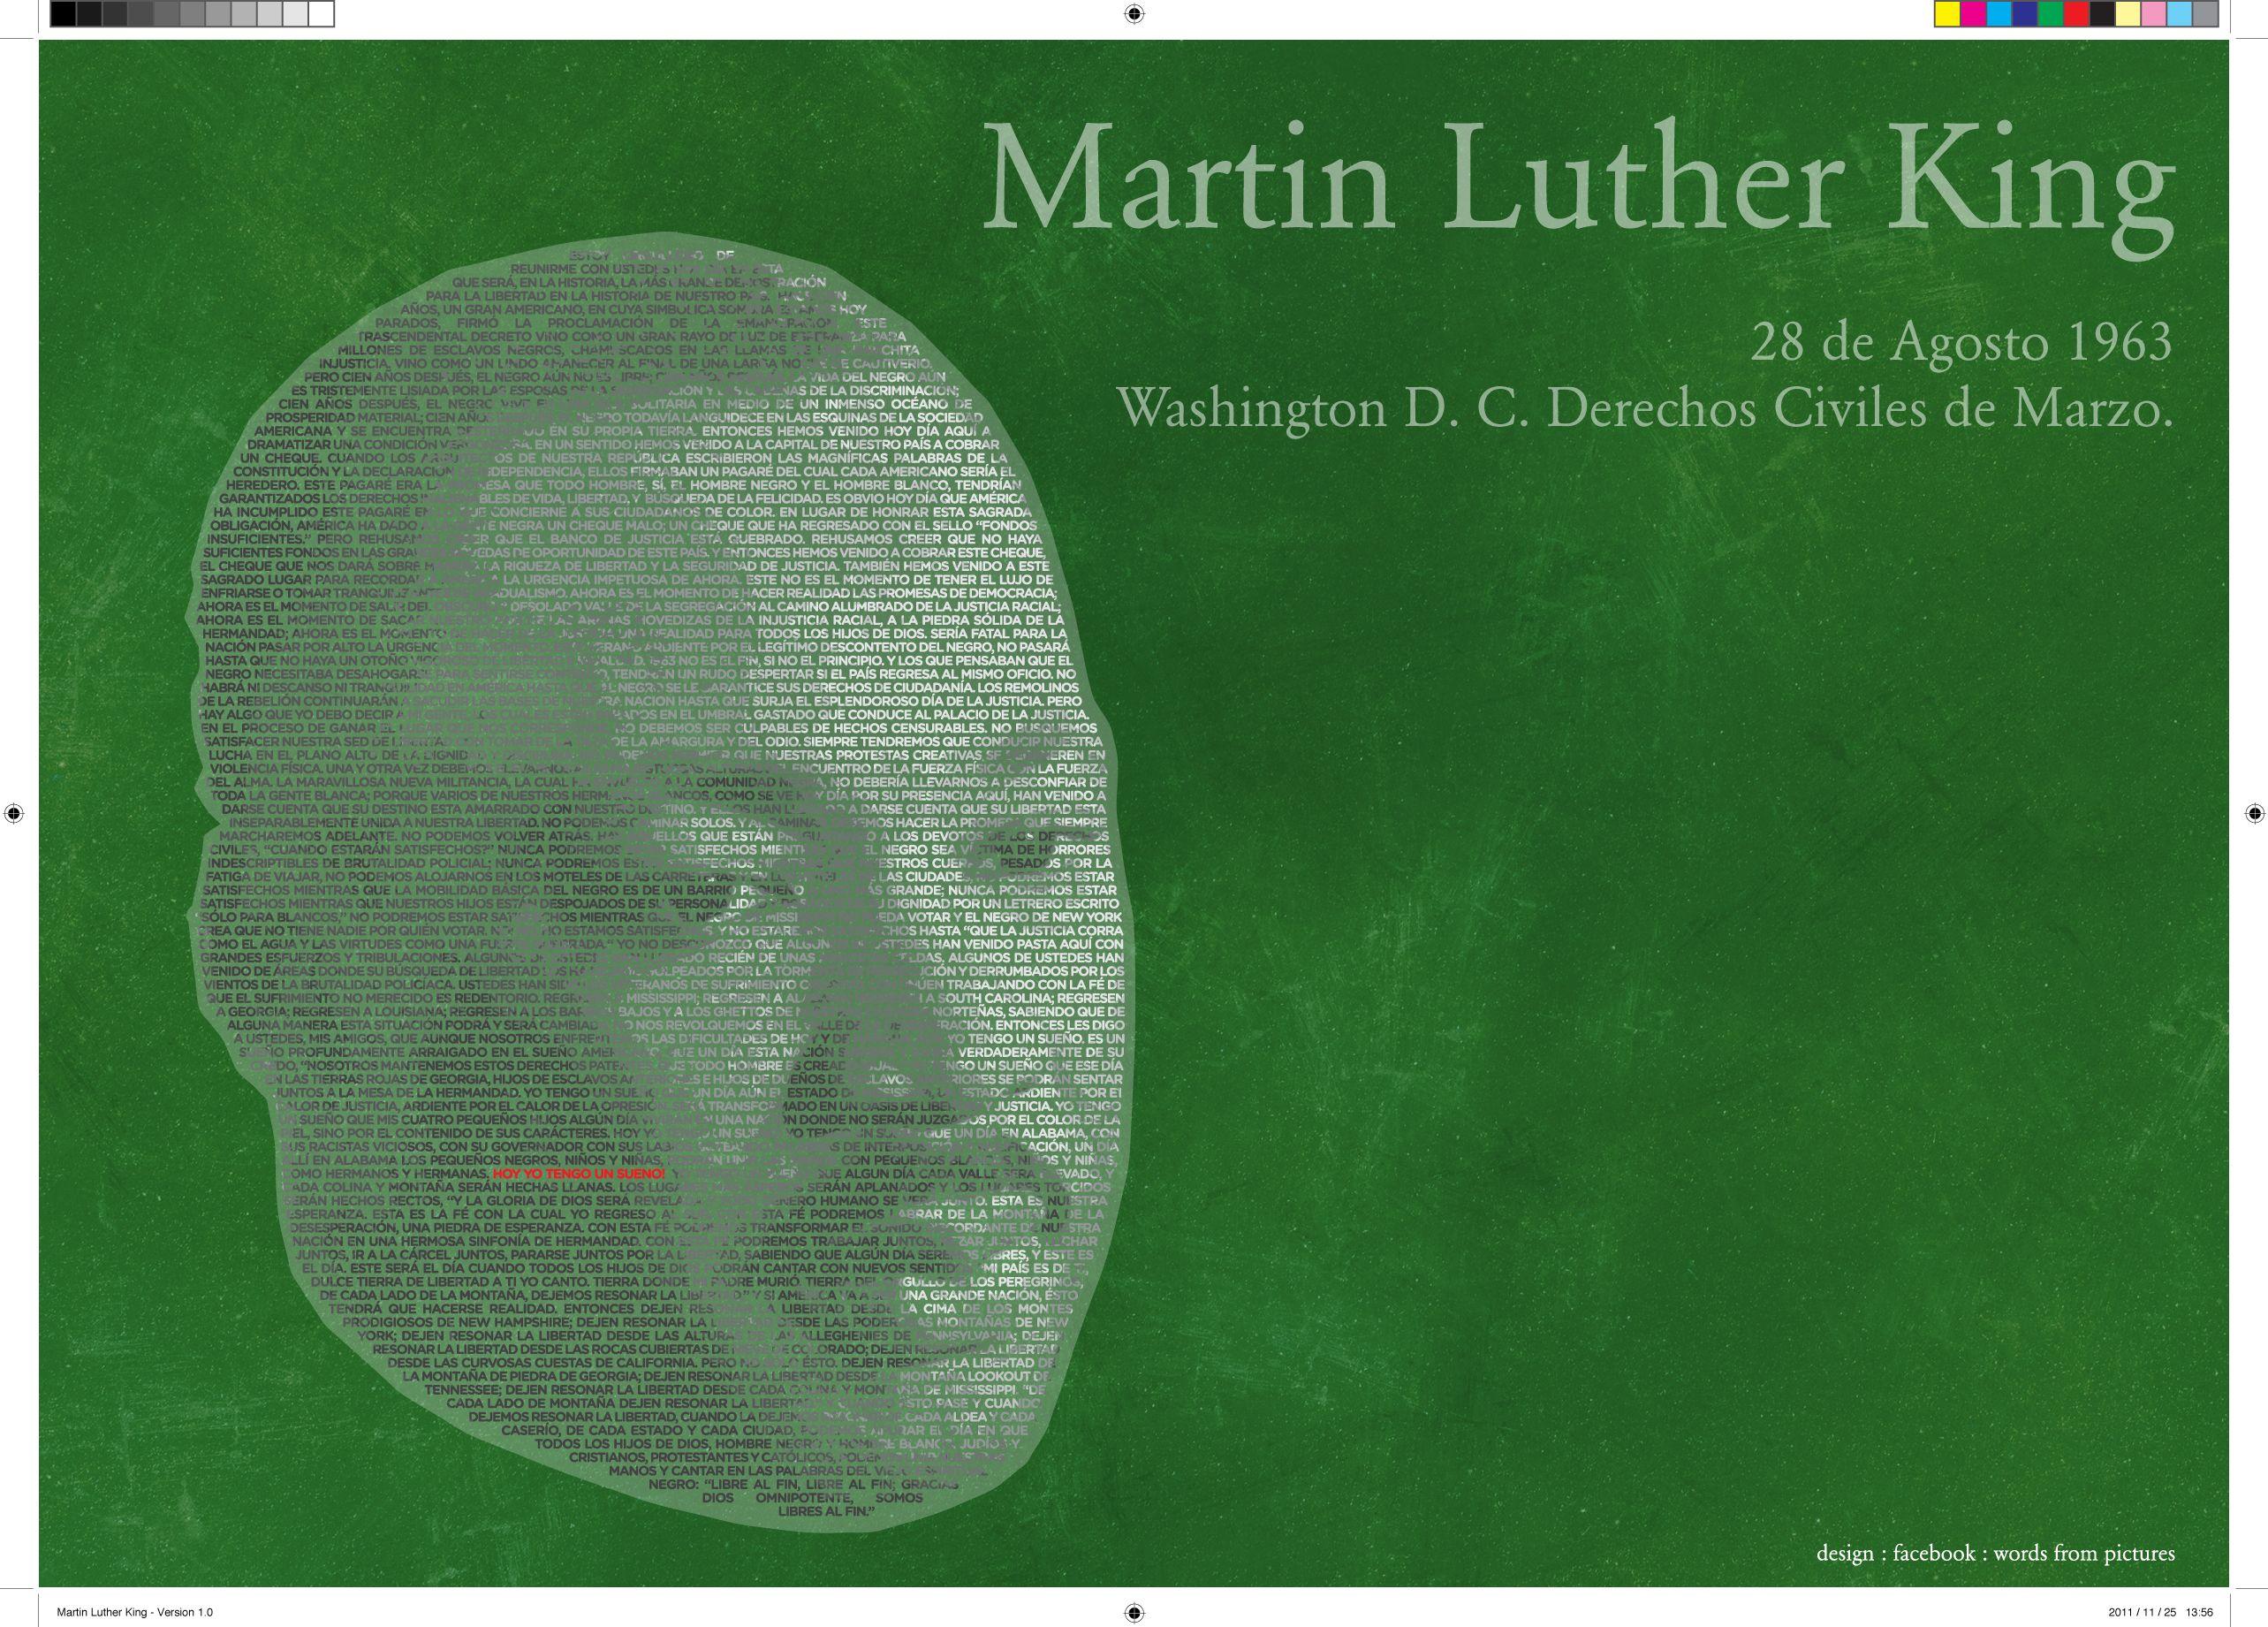 Martin Luther King - Yo tengo un sueño